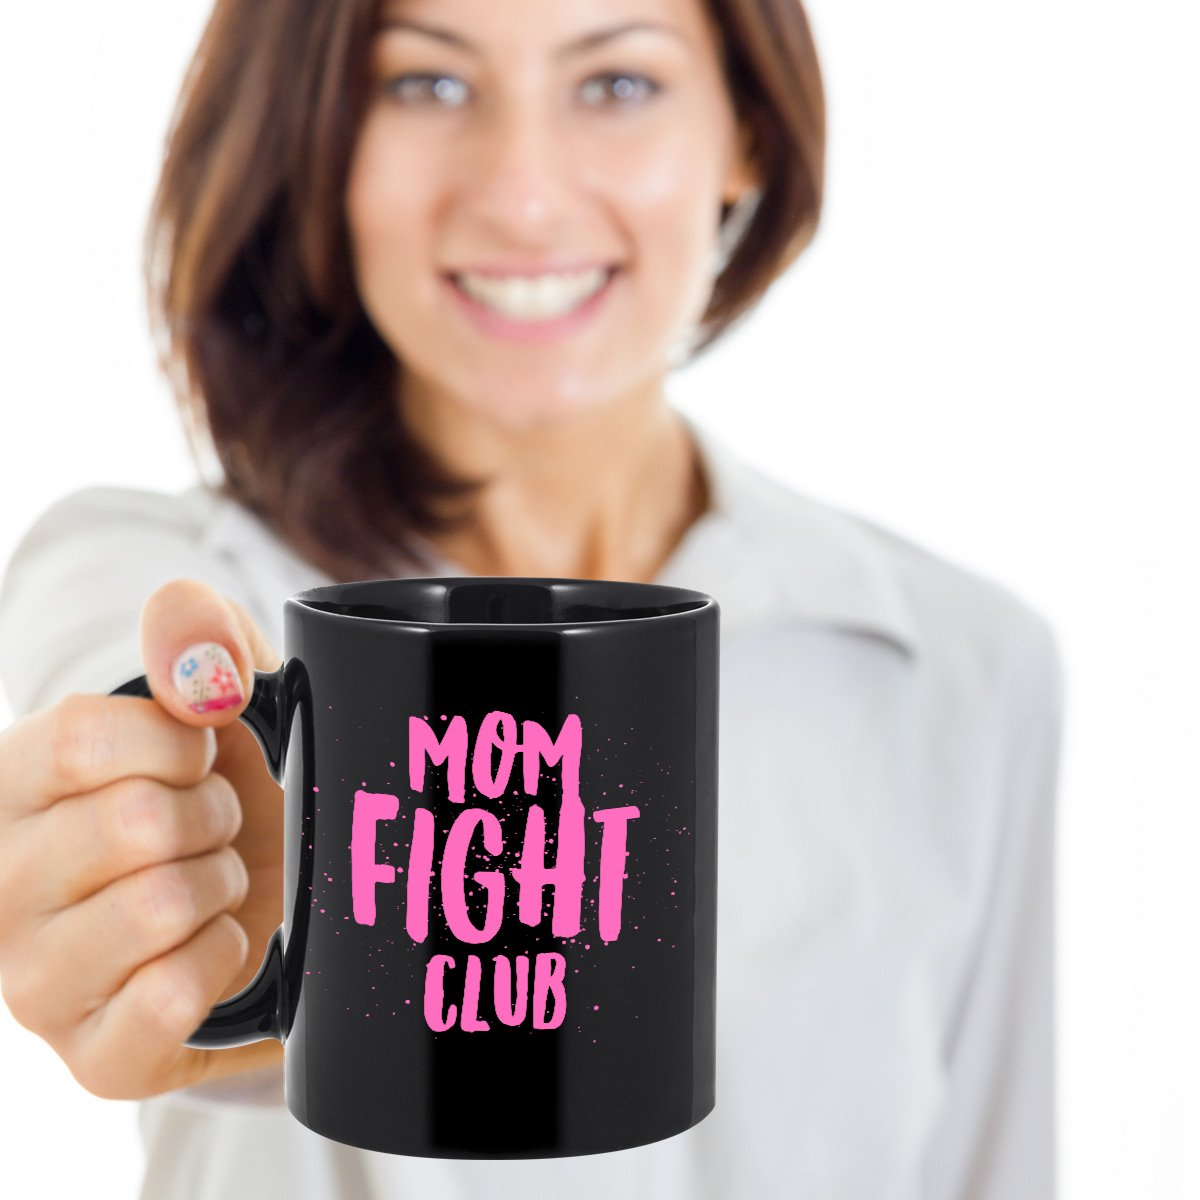 Here's how I #DisappointYourMotherIn3Words #MomFightClub  https://t.co/kMhVDICOWa https://t.co/ciQTLIqCUM